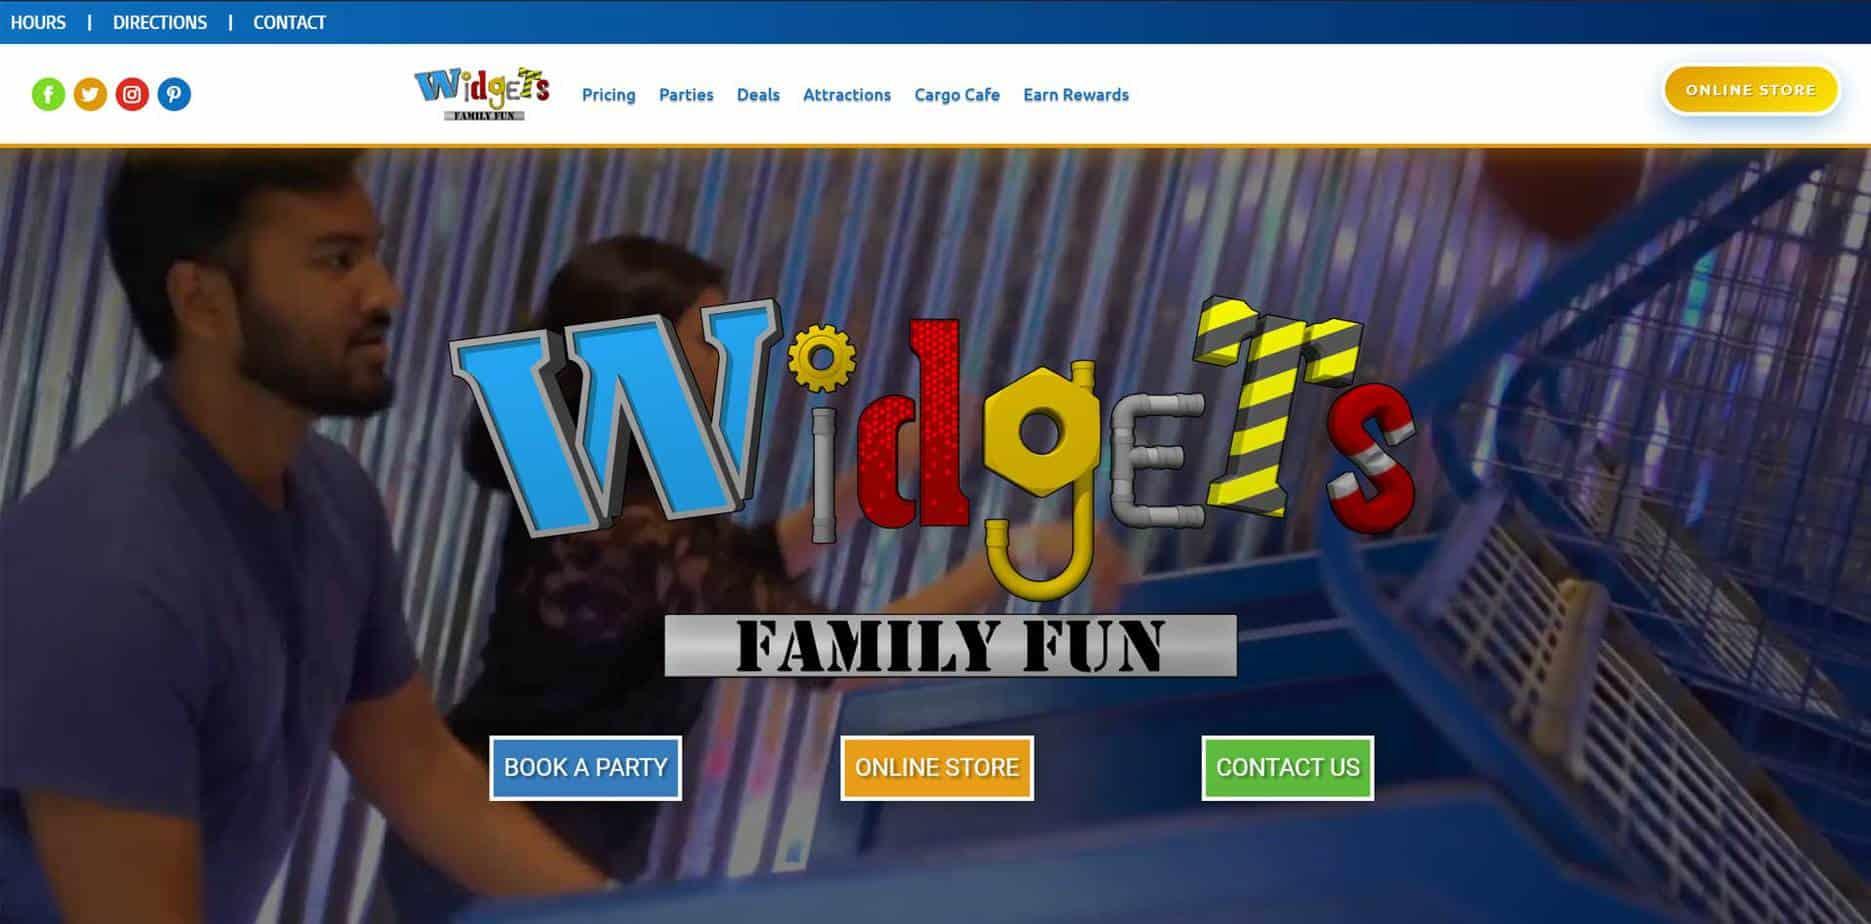 Widgets Family Fun - Kansas Website Design